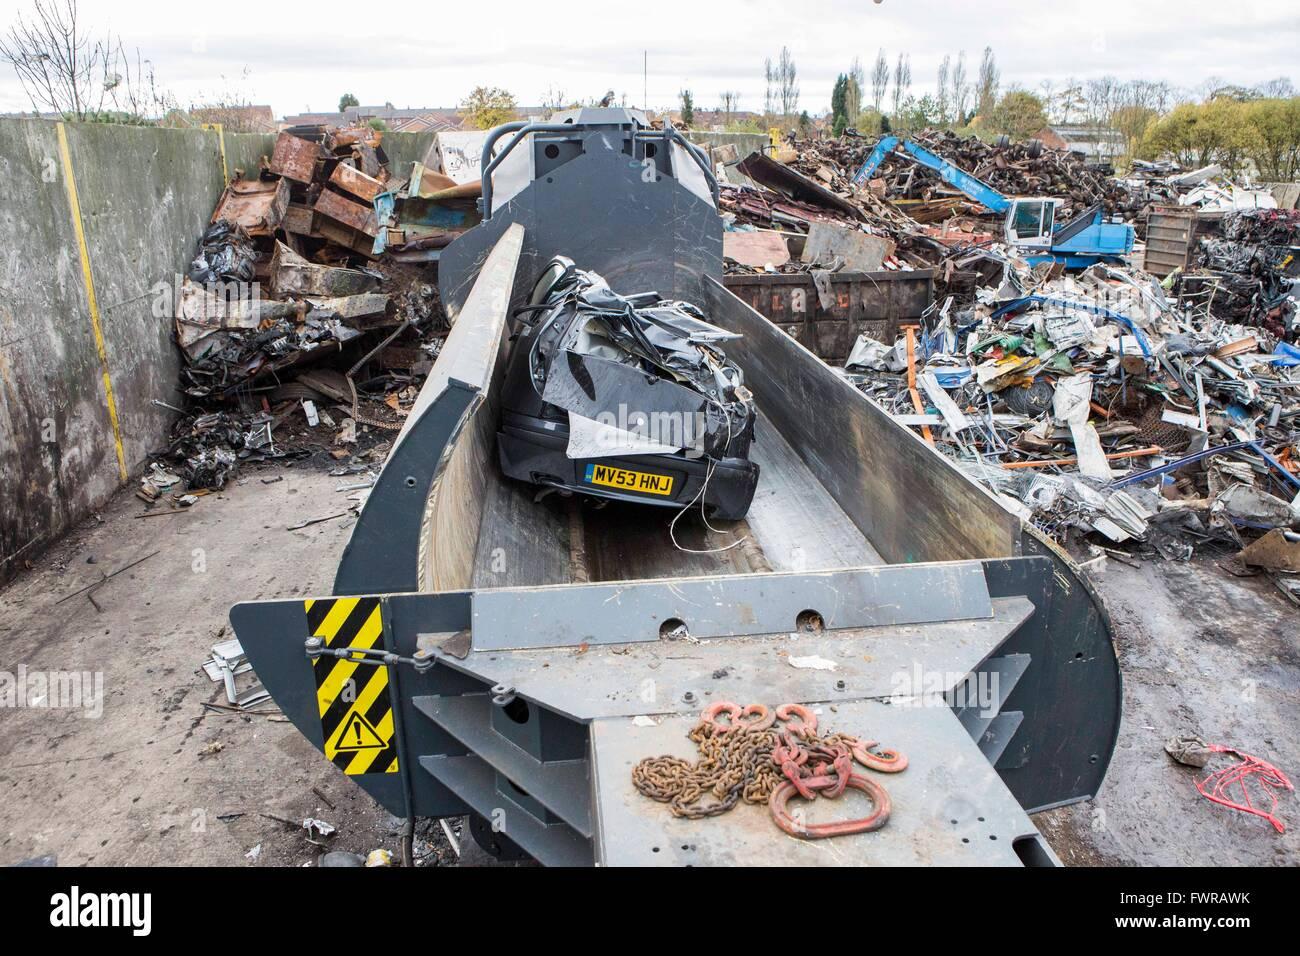 A car crusher in a metal scrap yard in England - Stock Image